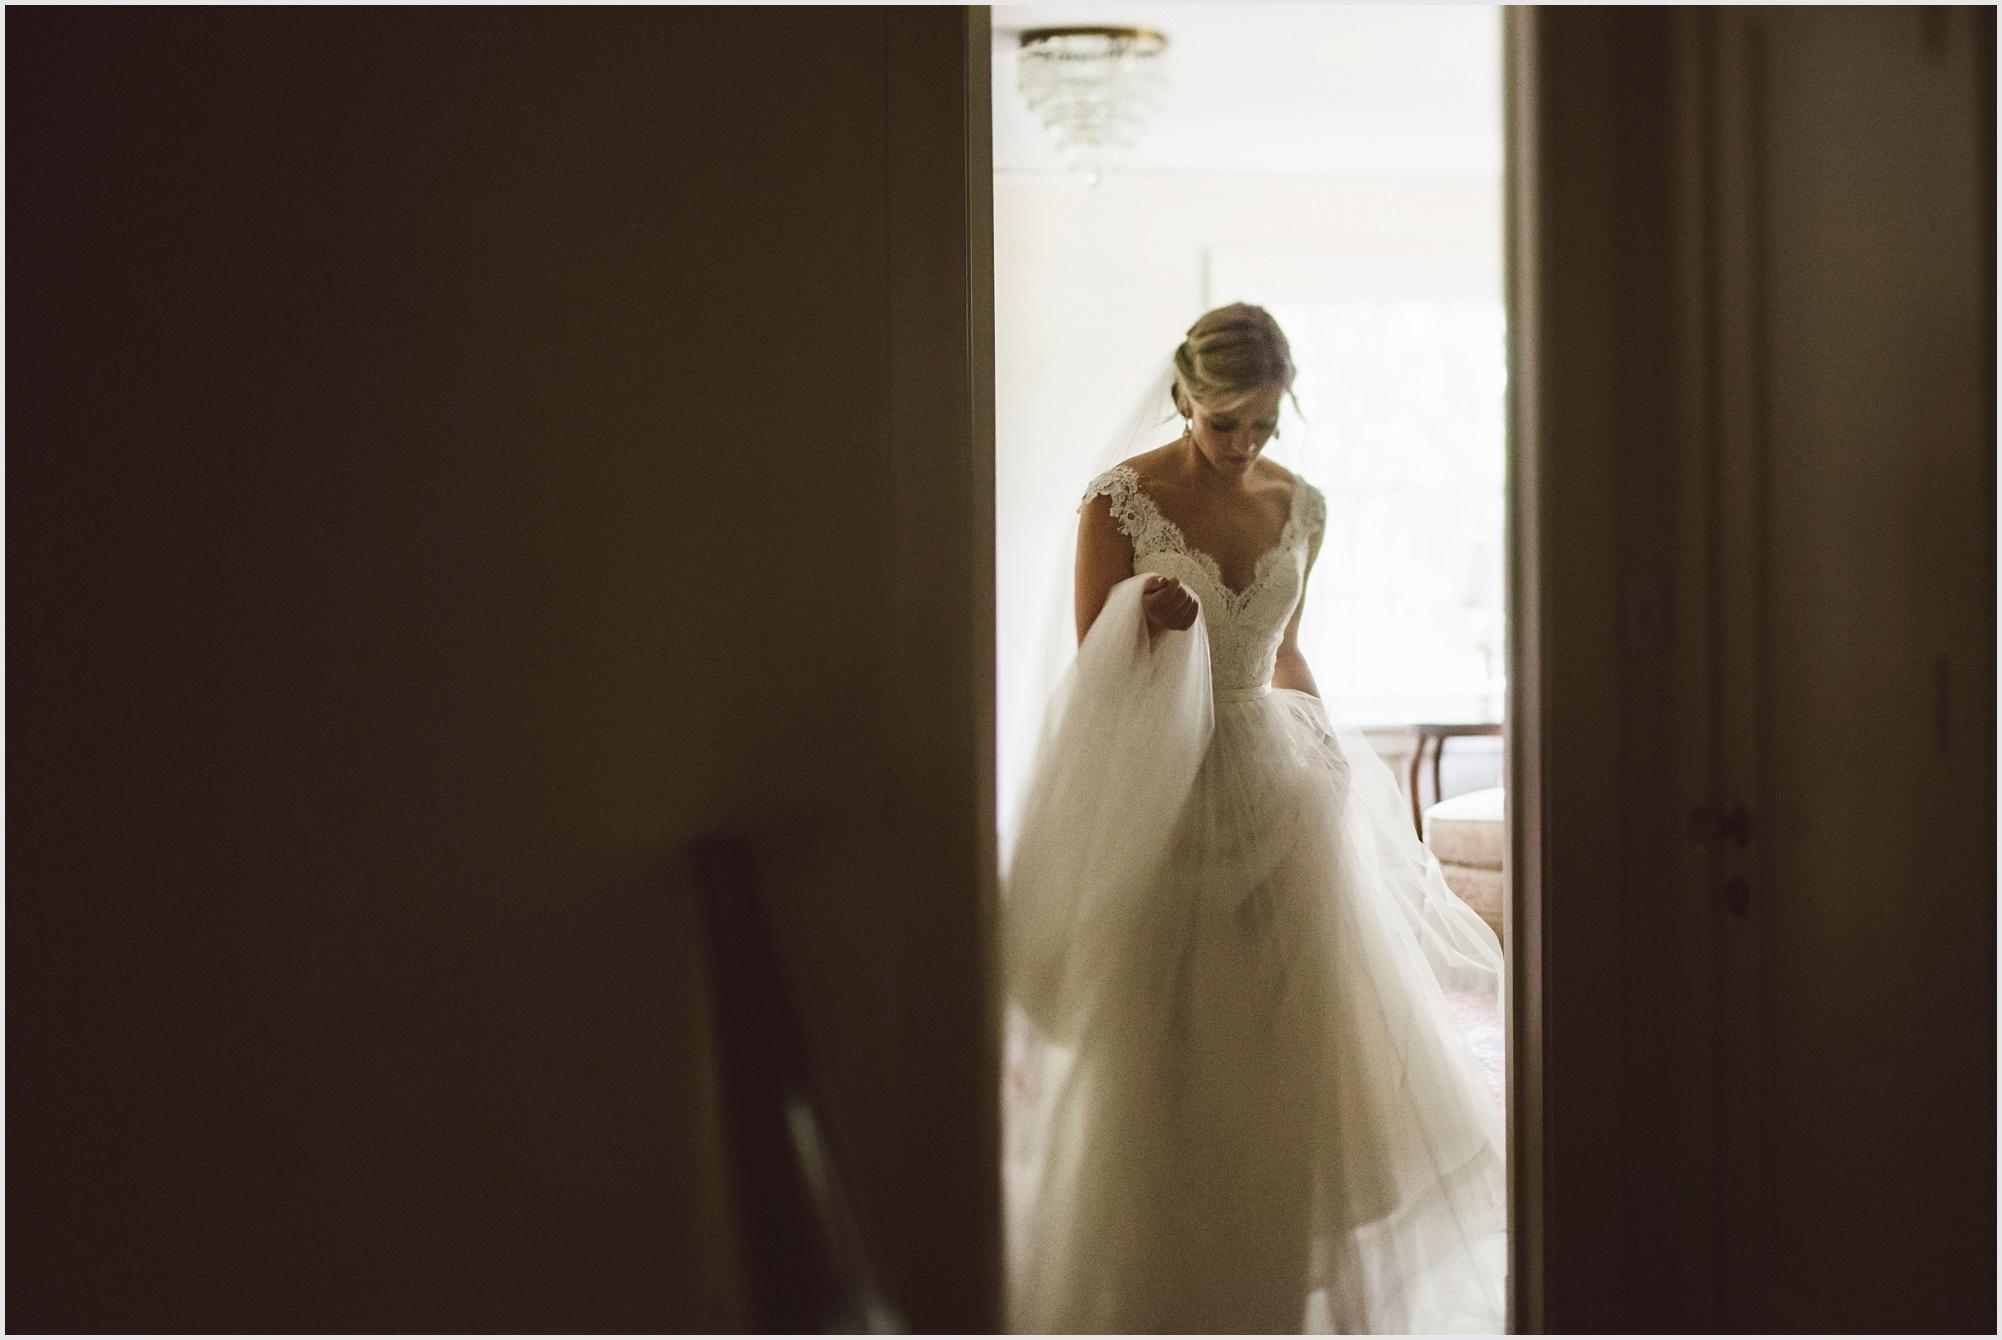 maura_david_james_j_hill_wedding_lucas_botz_photography_007.jpg